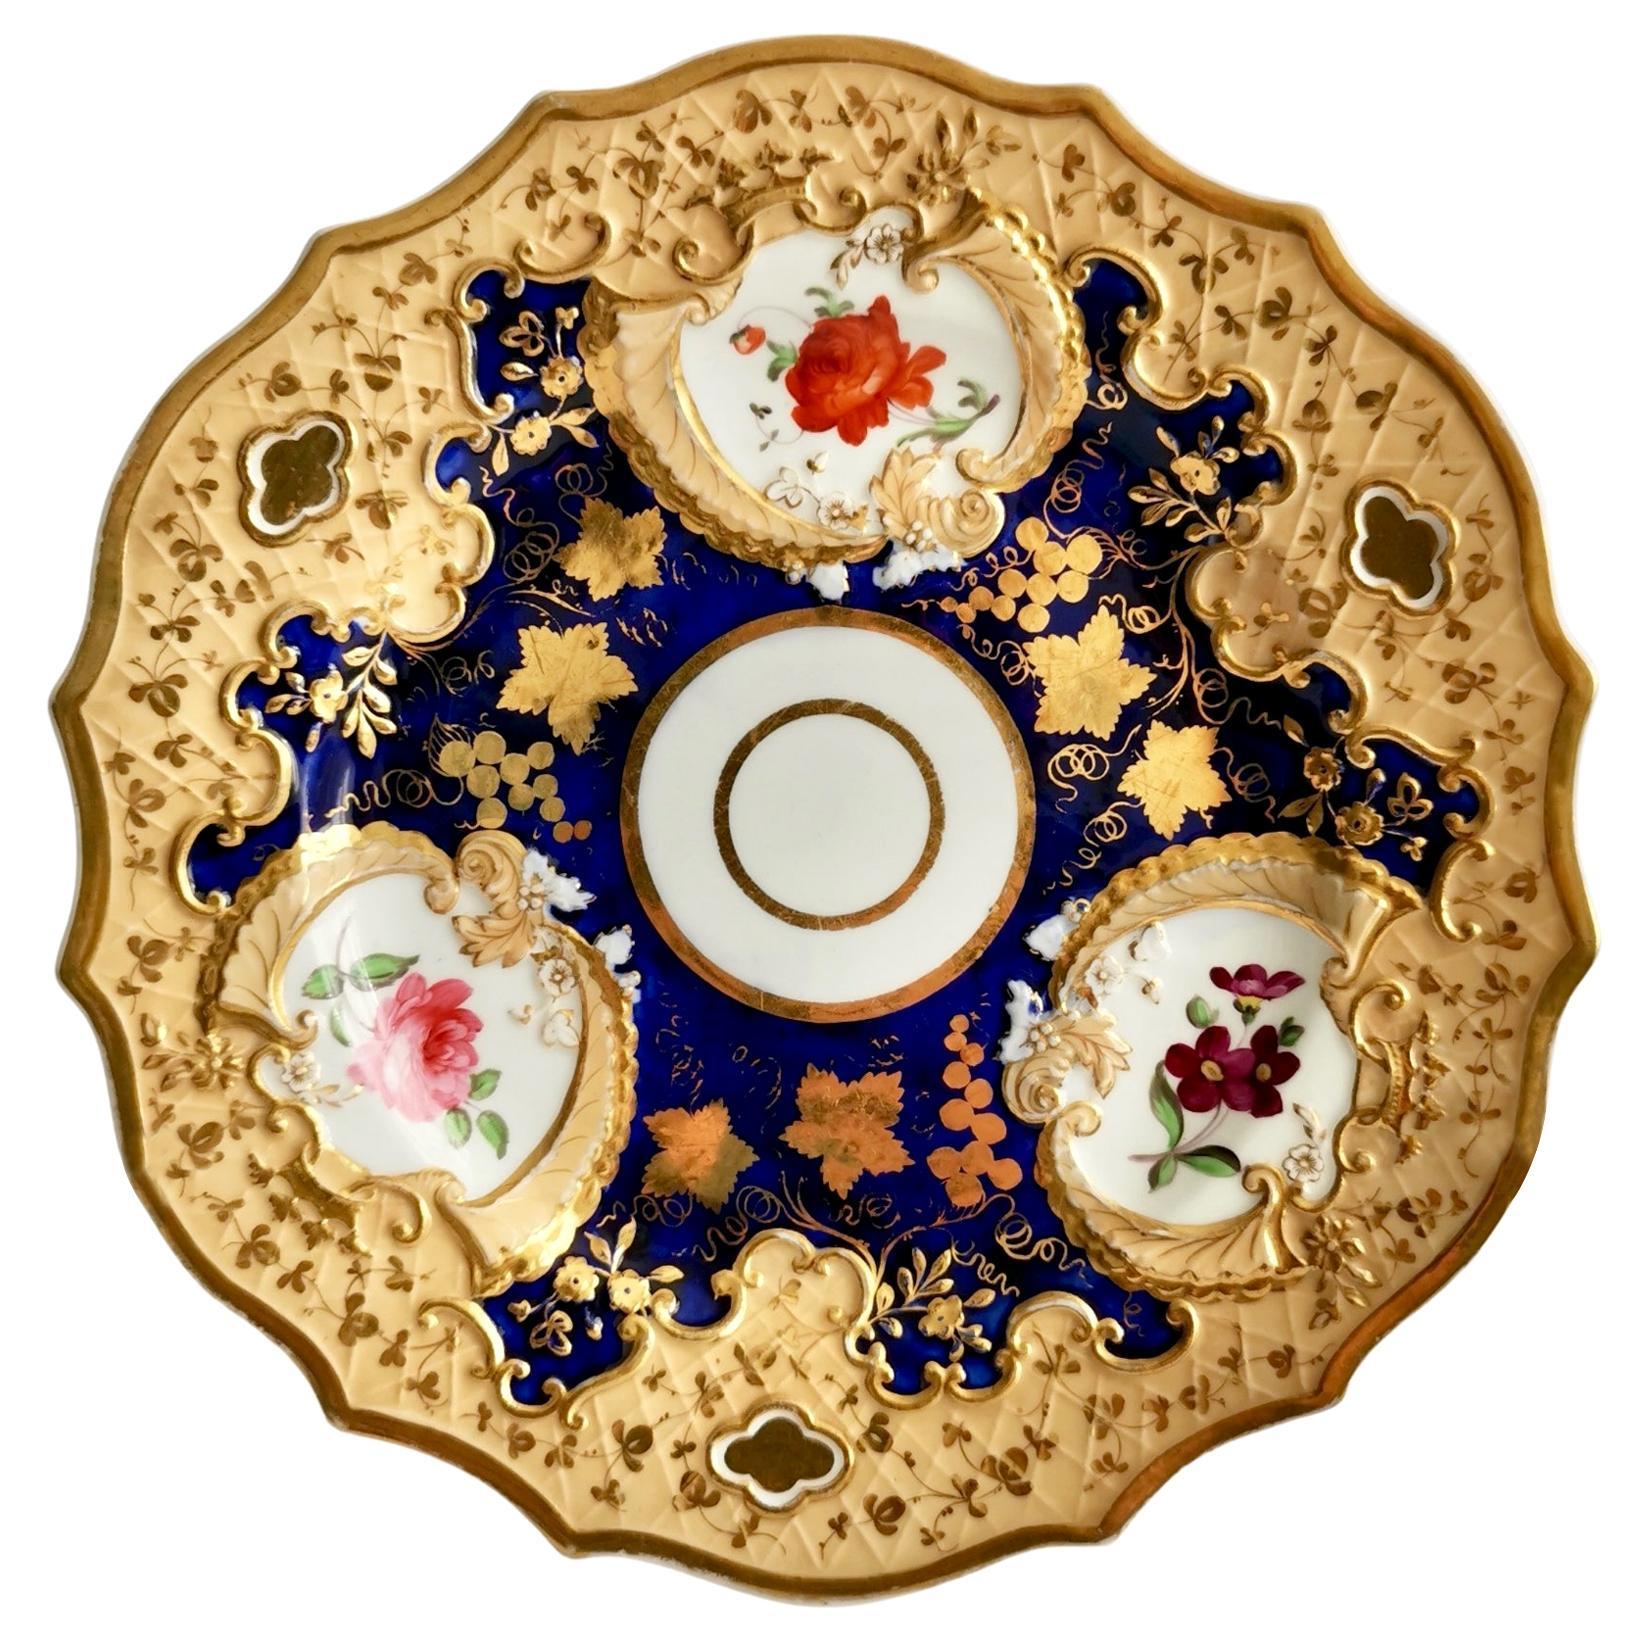 Ridgway Porcelain Plate, Cobalt Blue, Gilt and Flowers, Regency, circa 1820